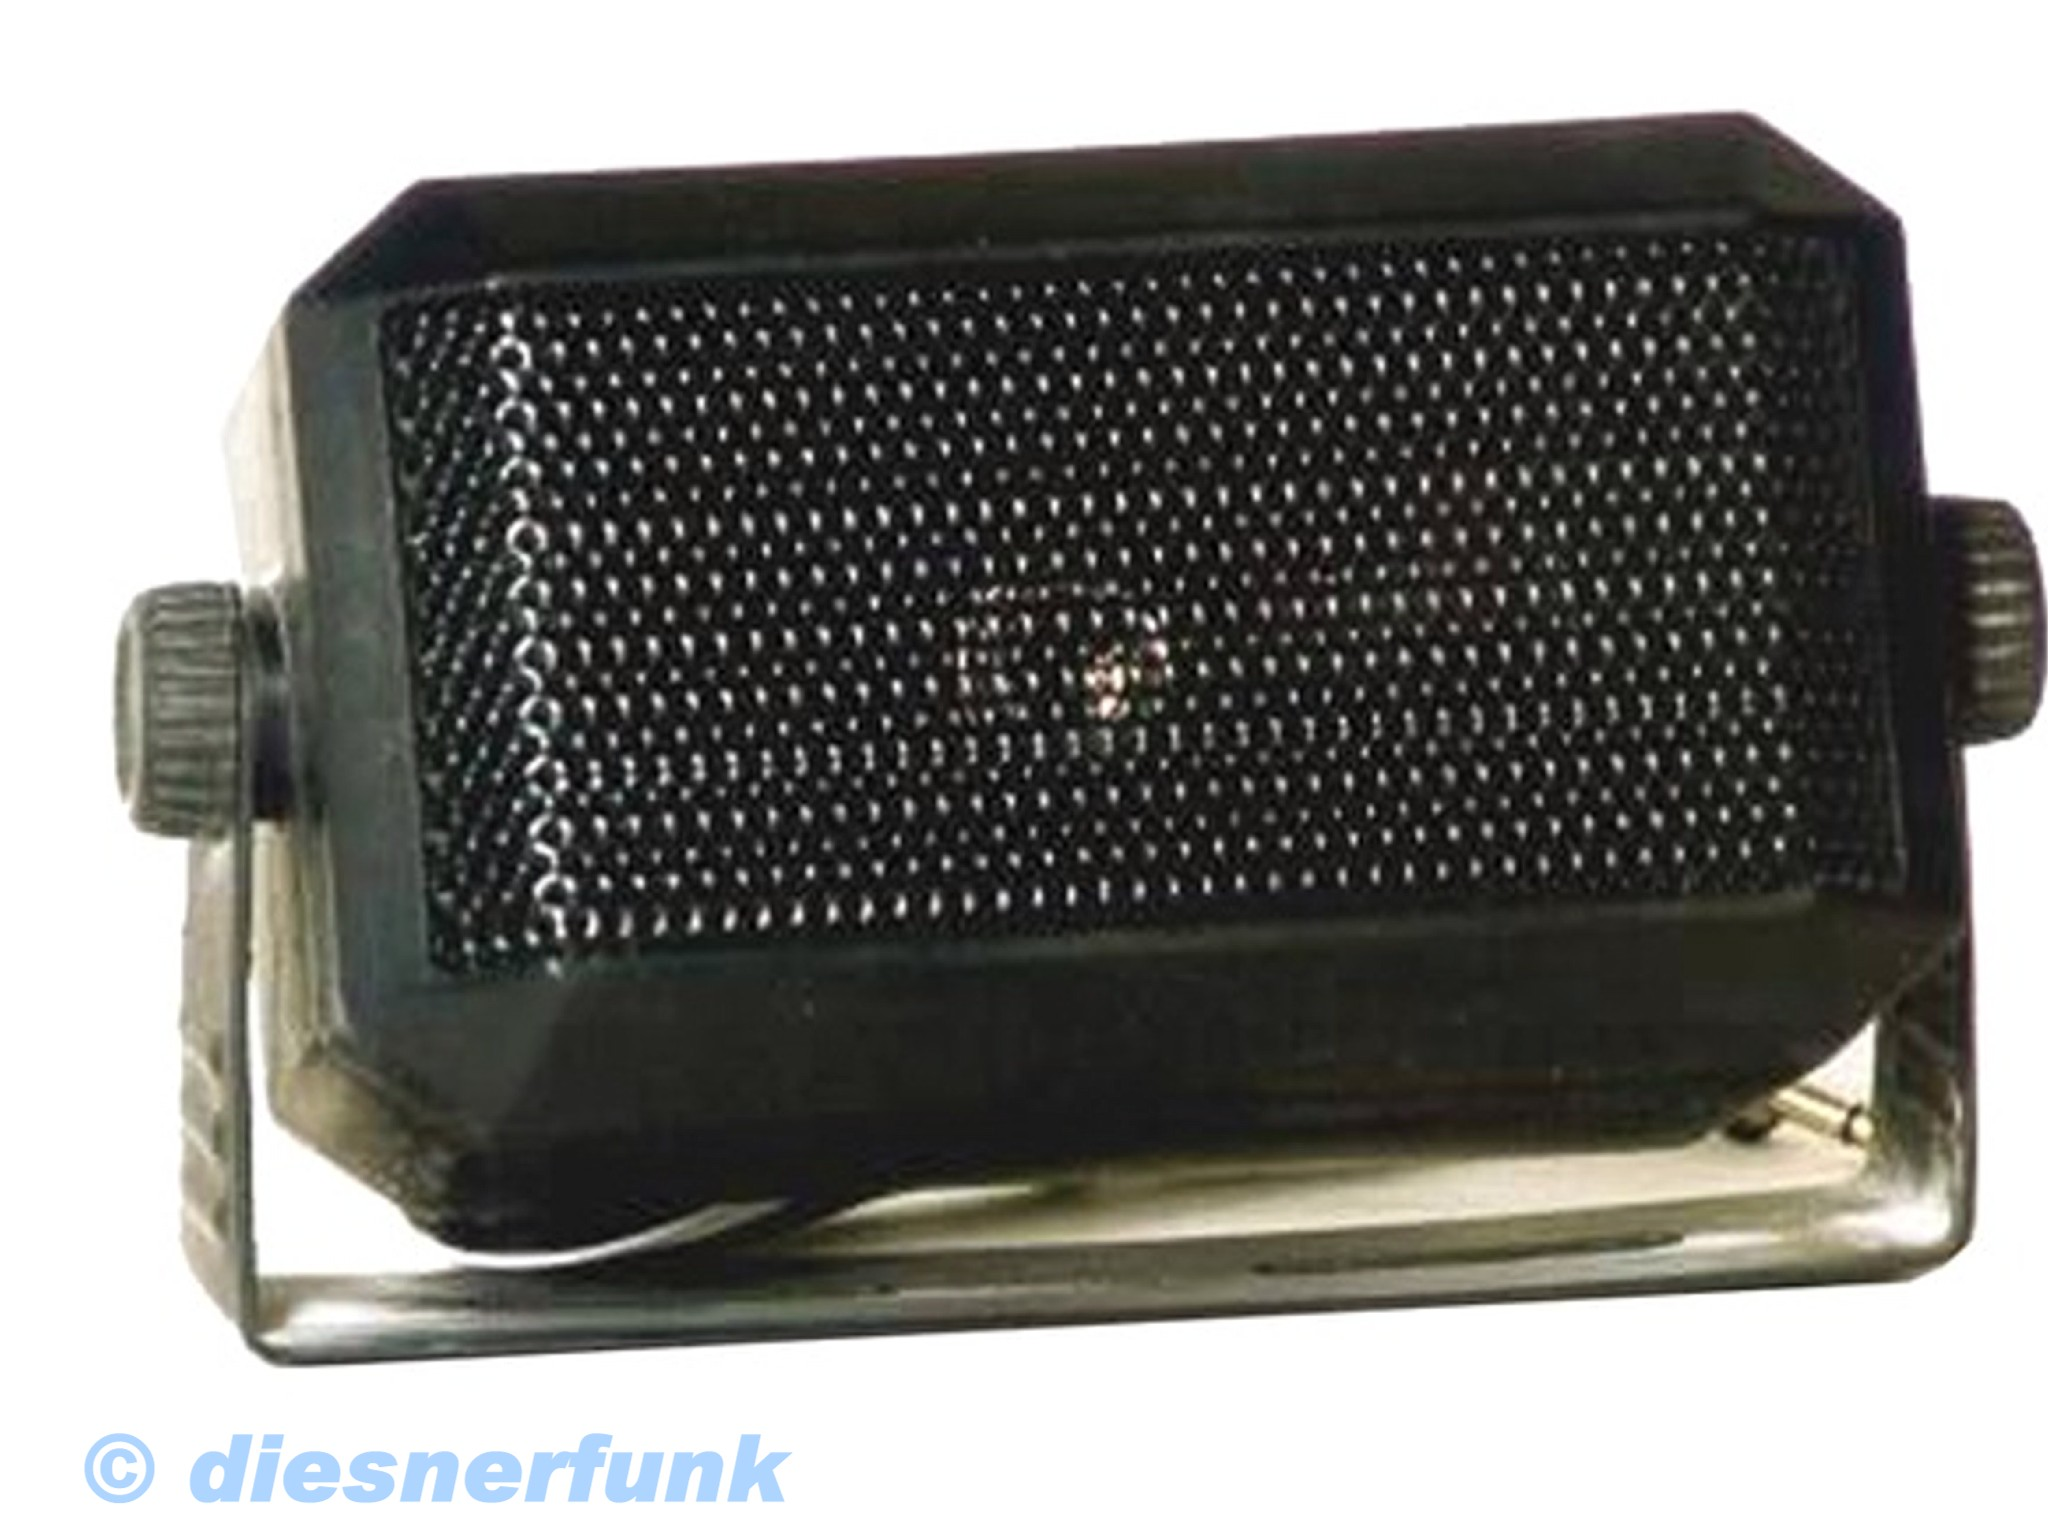 cb funk lautsprecher kls 250 5 watt zusatzlautsprecher lkw. Black Bedroom Furniture Sets. Home Design Ideas